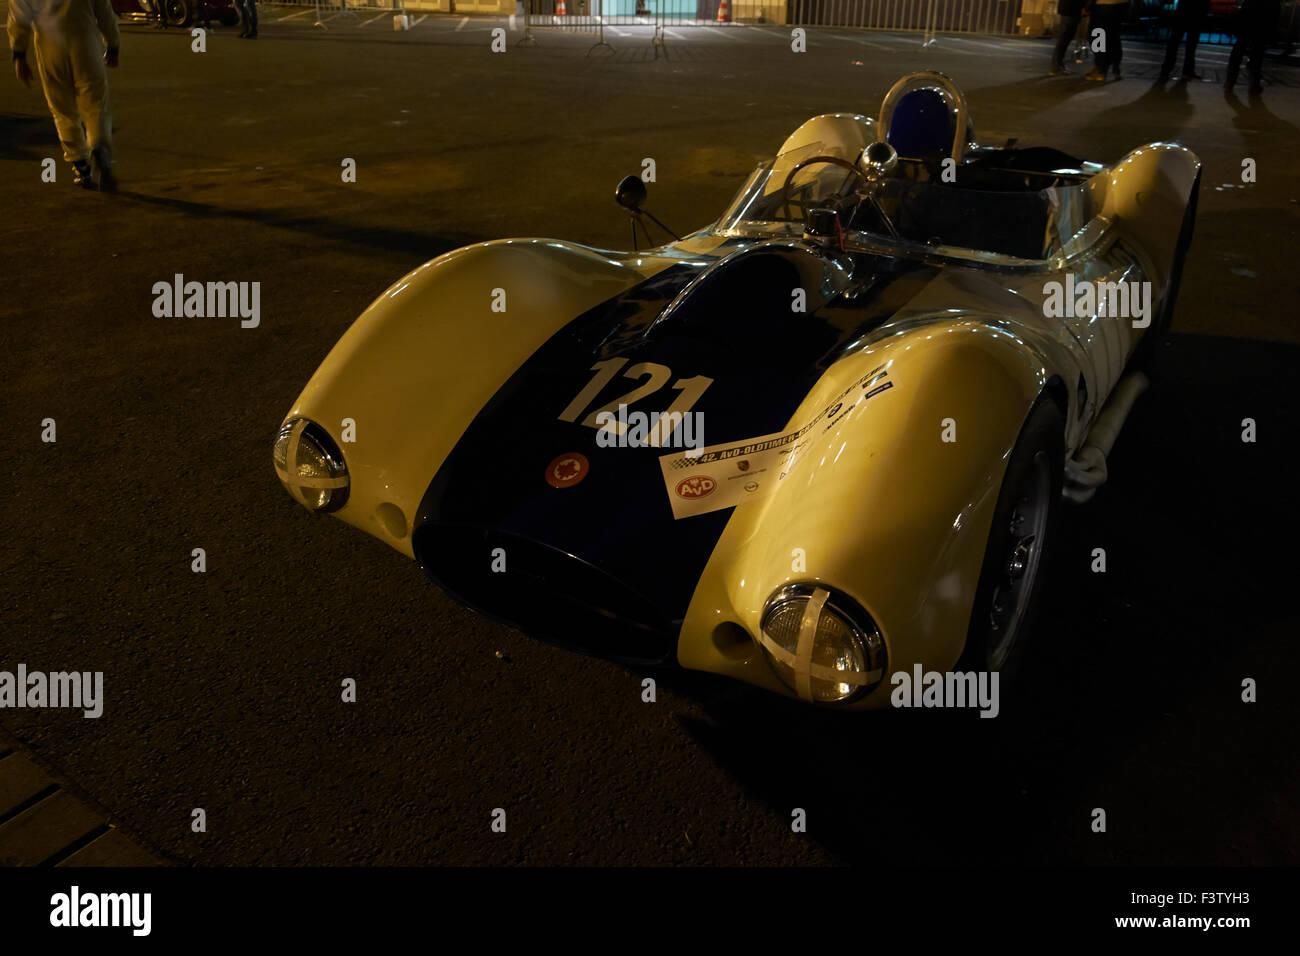 Sadler Mk III,1958, two-seater and GT up to 1960/61, parc ferme, 42.AvD-Oldtimer Grand Prix 2014 Nürburgring - Stock Image